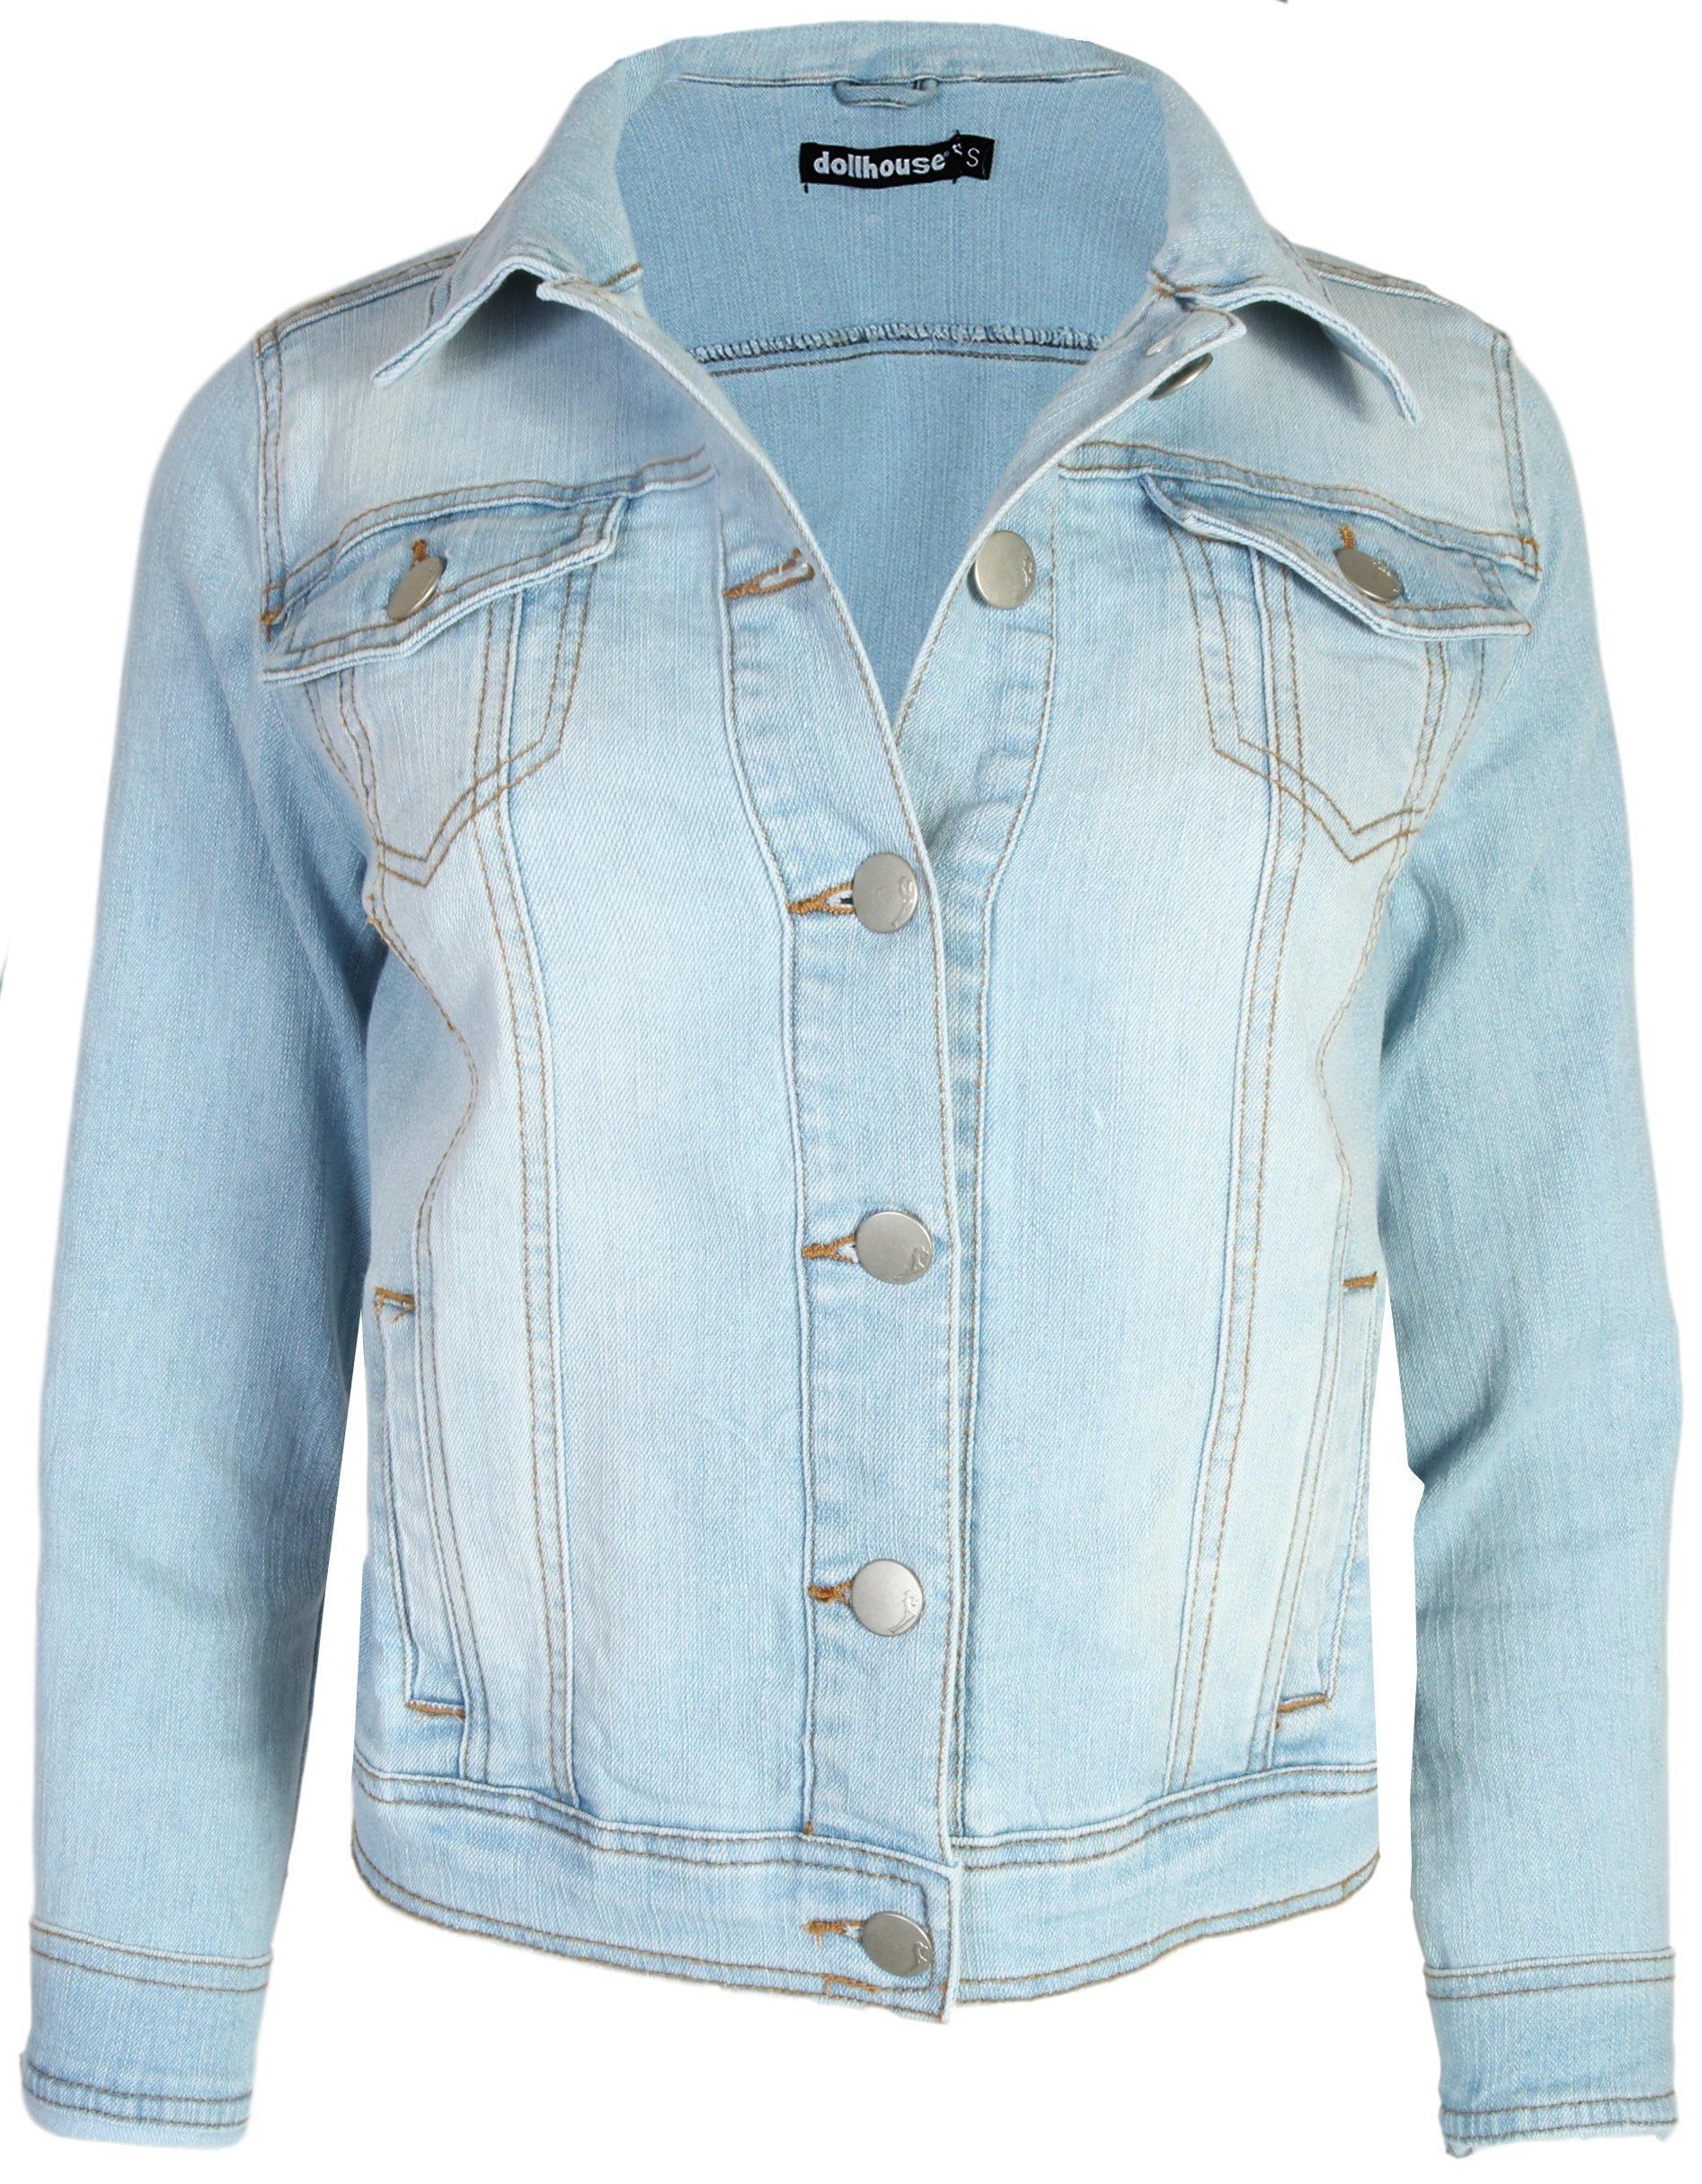 dollhouse Women Basic Denim Jean Jacket, Light, X-Large'